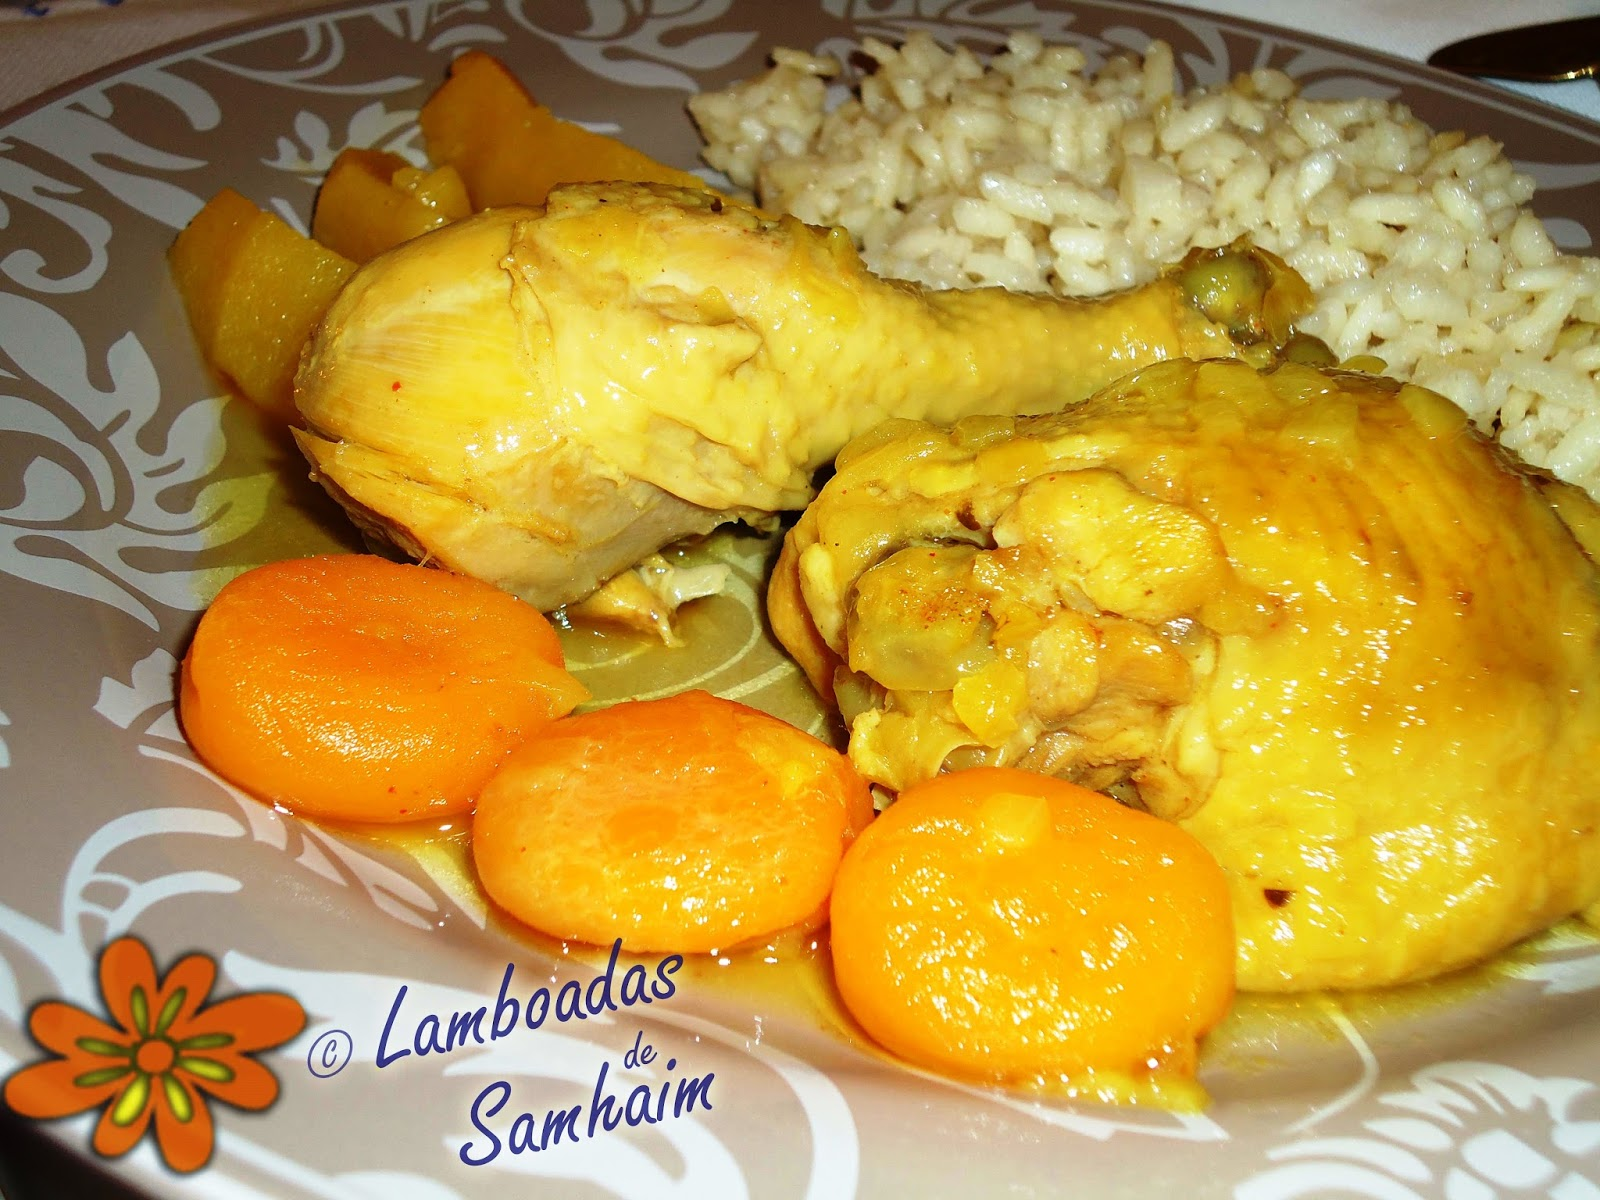 Lamboadas de Samhaim: Pollo con albaricoques en tagine